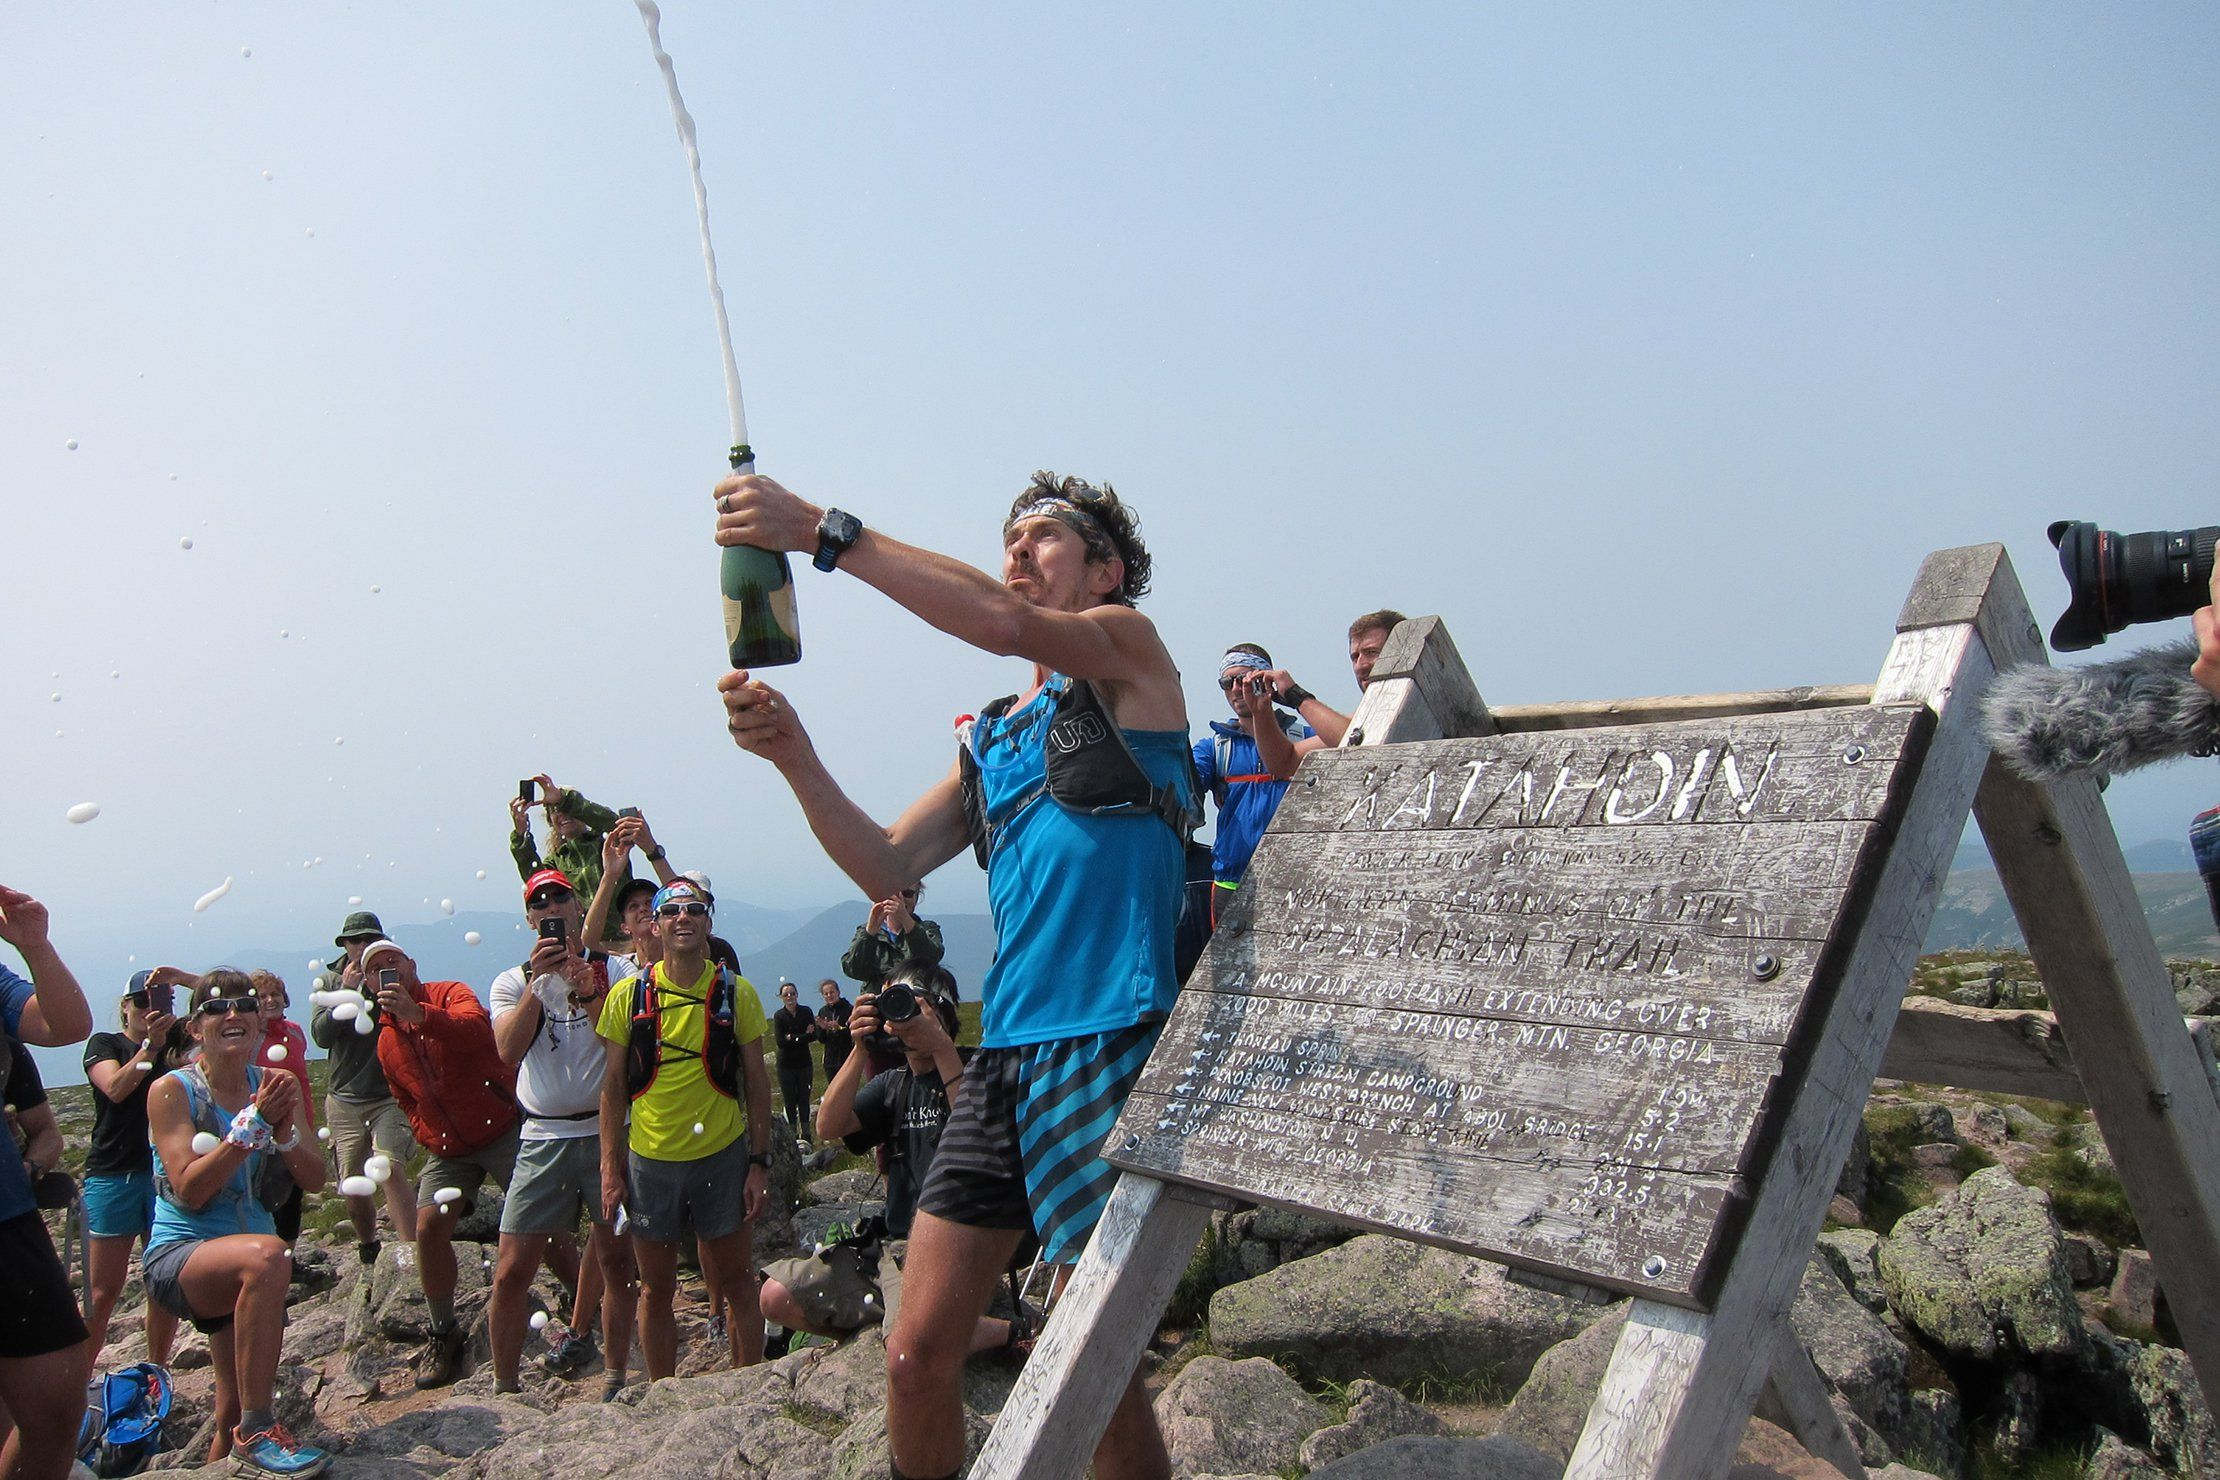 c9d8c70e781c3 Scott Jurek Celebrates a New Appalachian Trail Thru-Hike Speed Record